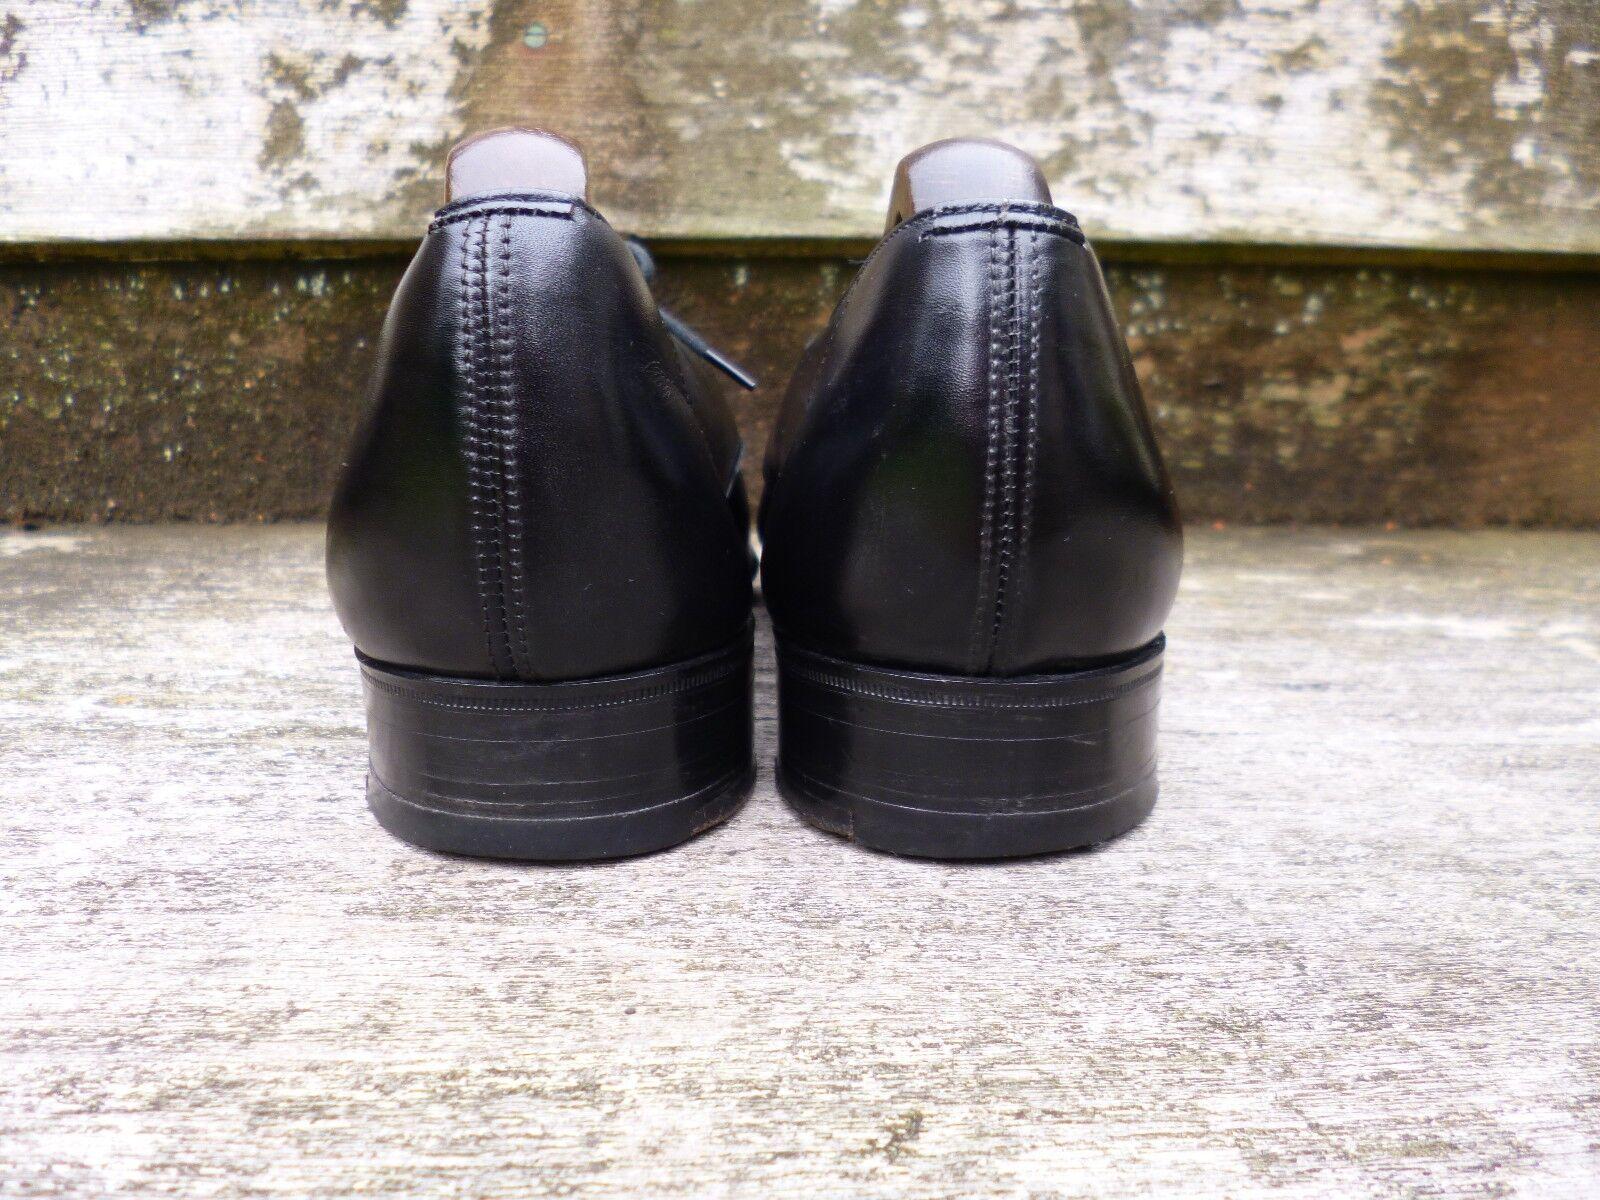 CHURCH VINTAGE DERBY DERBY DERBY – BLACK CALF – UK 8  – EXCELLENT CONDITION bb10a3